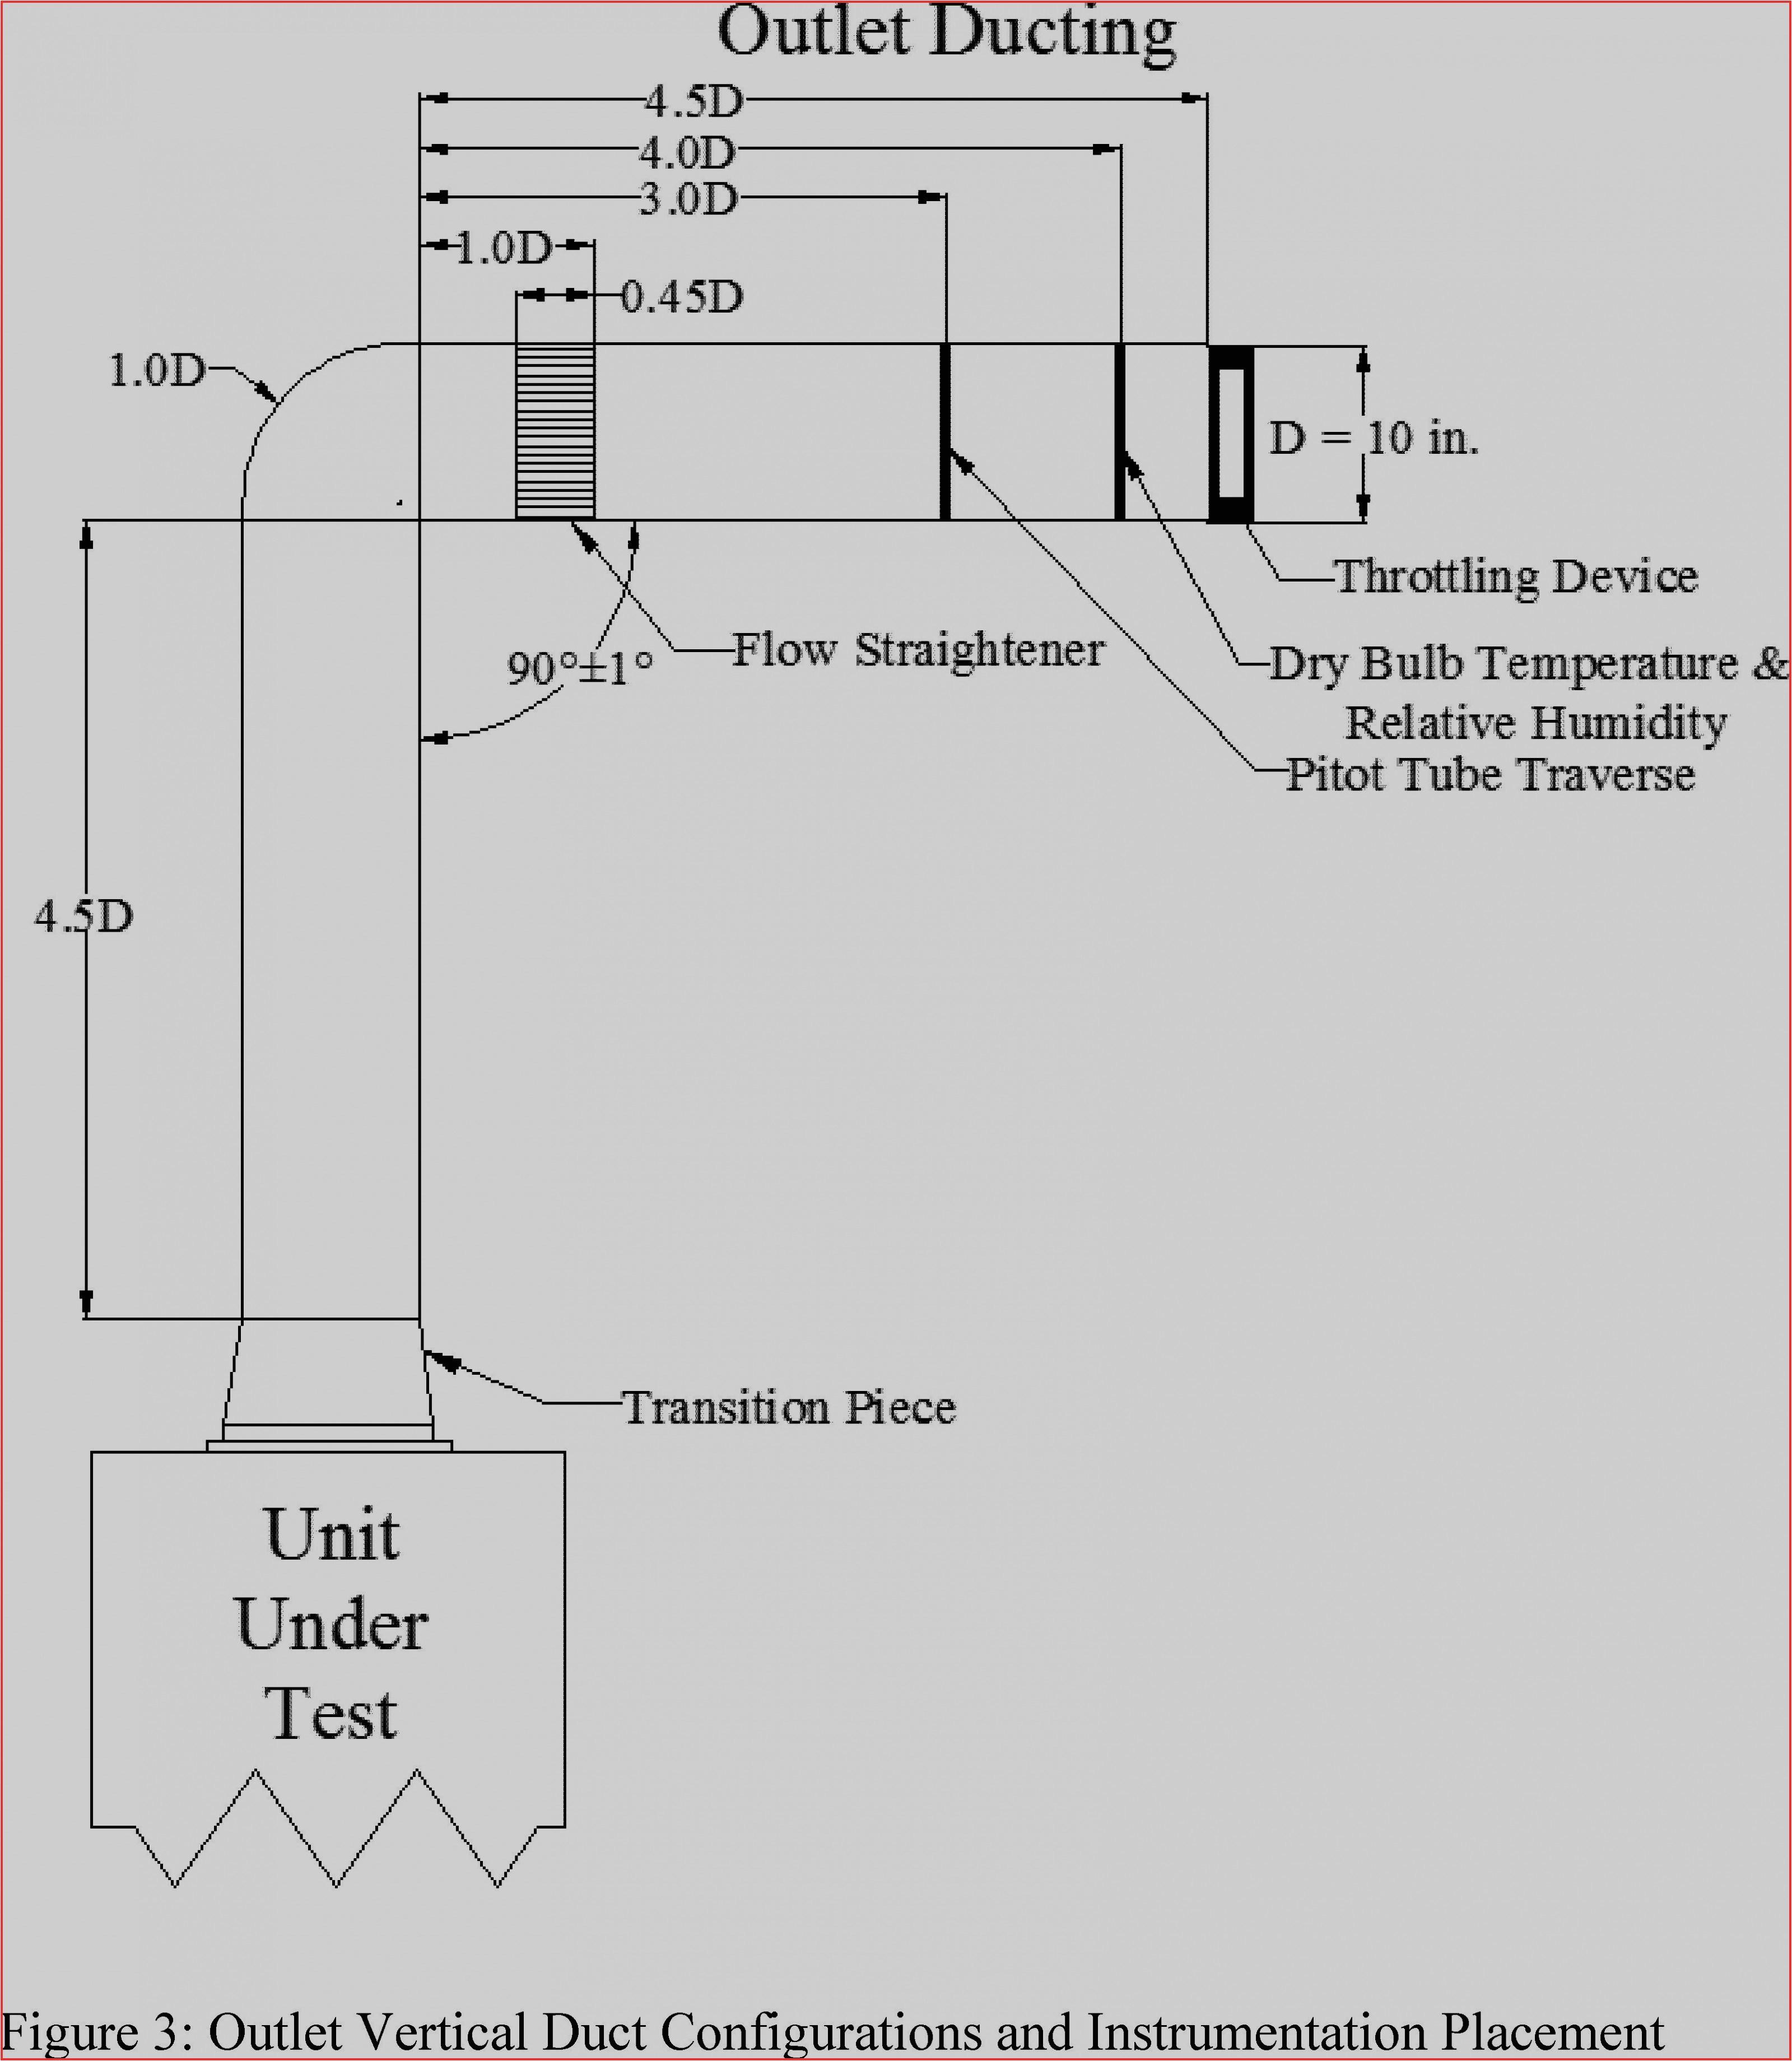 basic telephone wiring diagram att phone box diagram fuel pump amp relay diagram e280a2 of basic telephone wiring diagram jpg